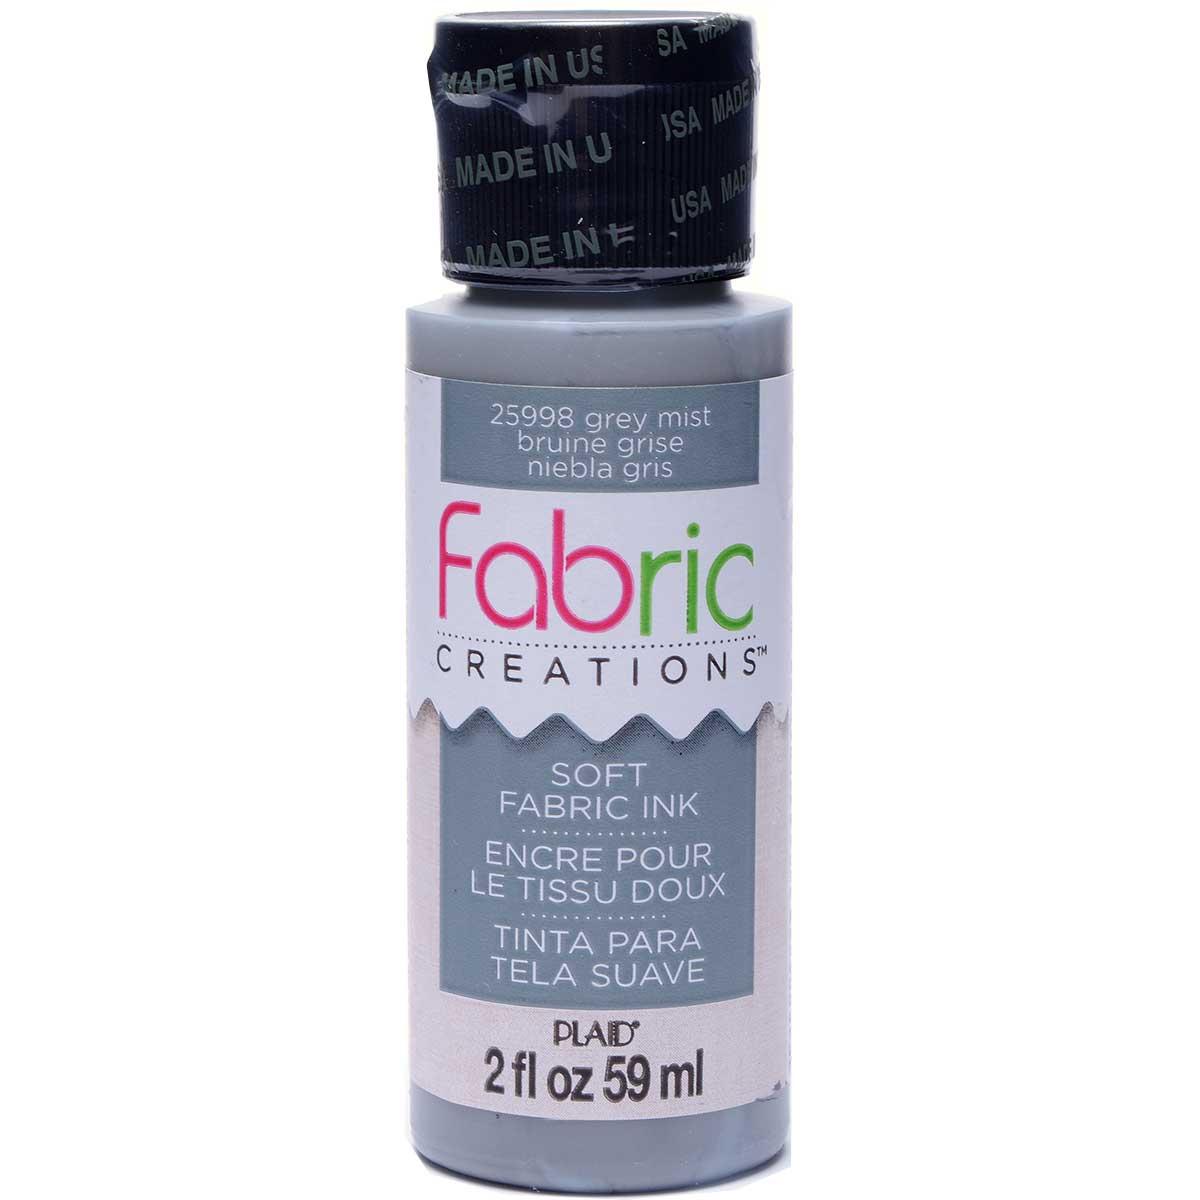 Fabric Creations™ Soft Fabric Inks - Grey Mist, 2 oz.